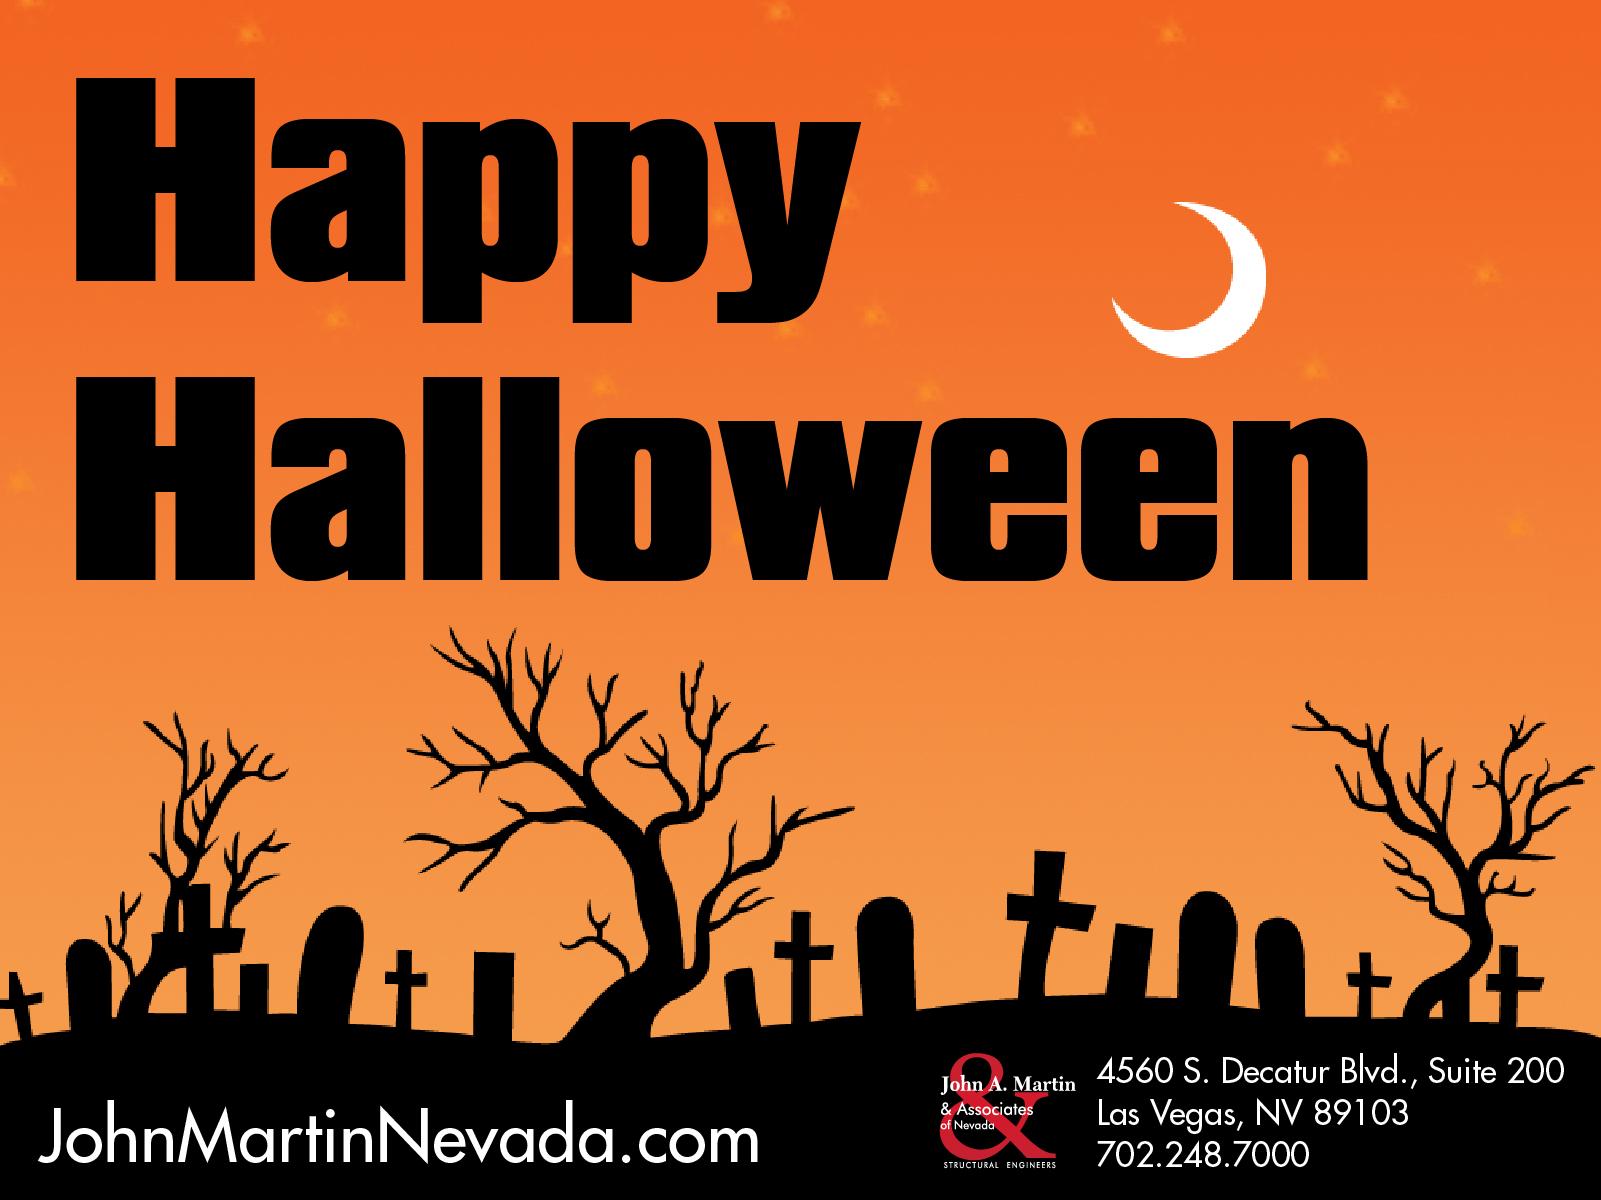 John A. Martin & Associates of Nevada - Happy Halloween